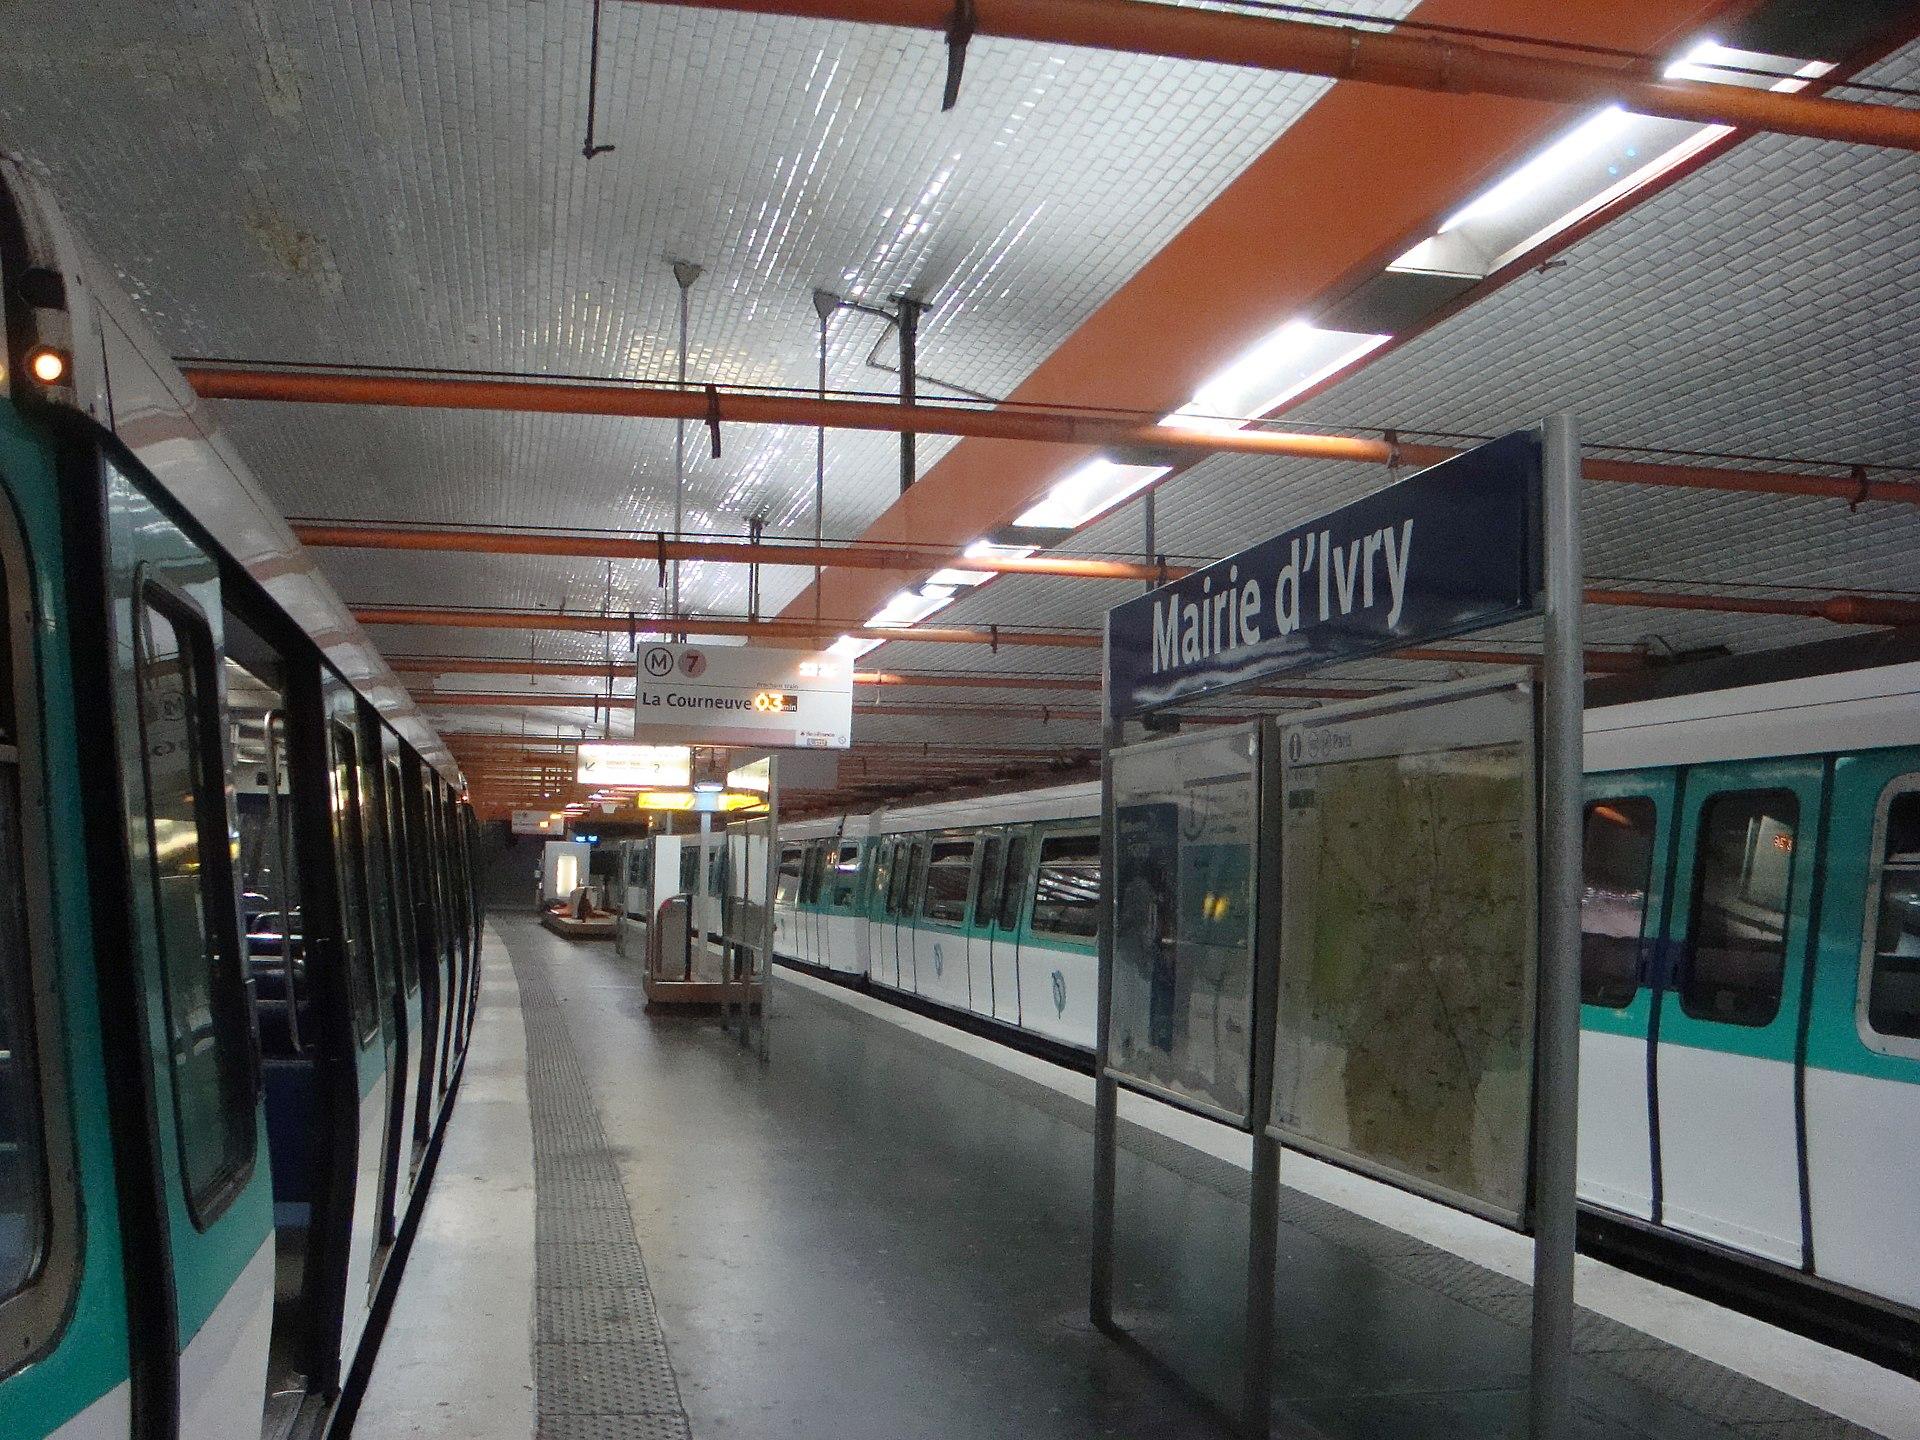 Mairie d 39 ivry paris m tro wikipedia - Metro porte d ivry ...